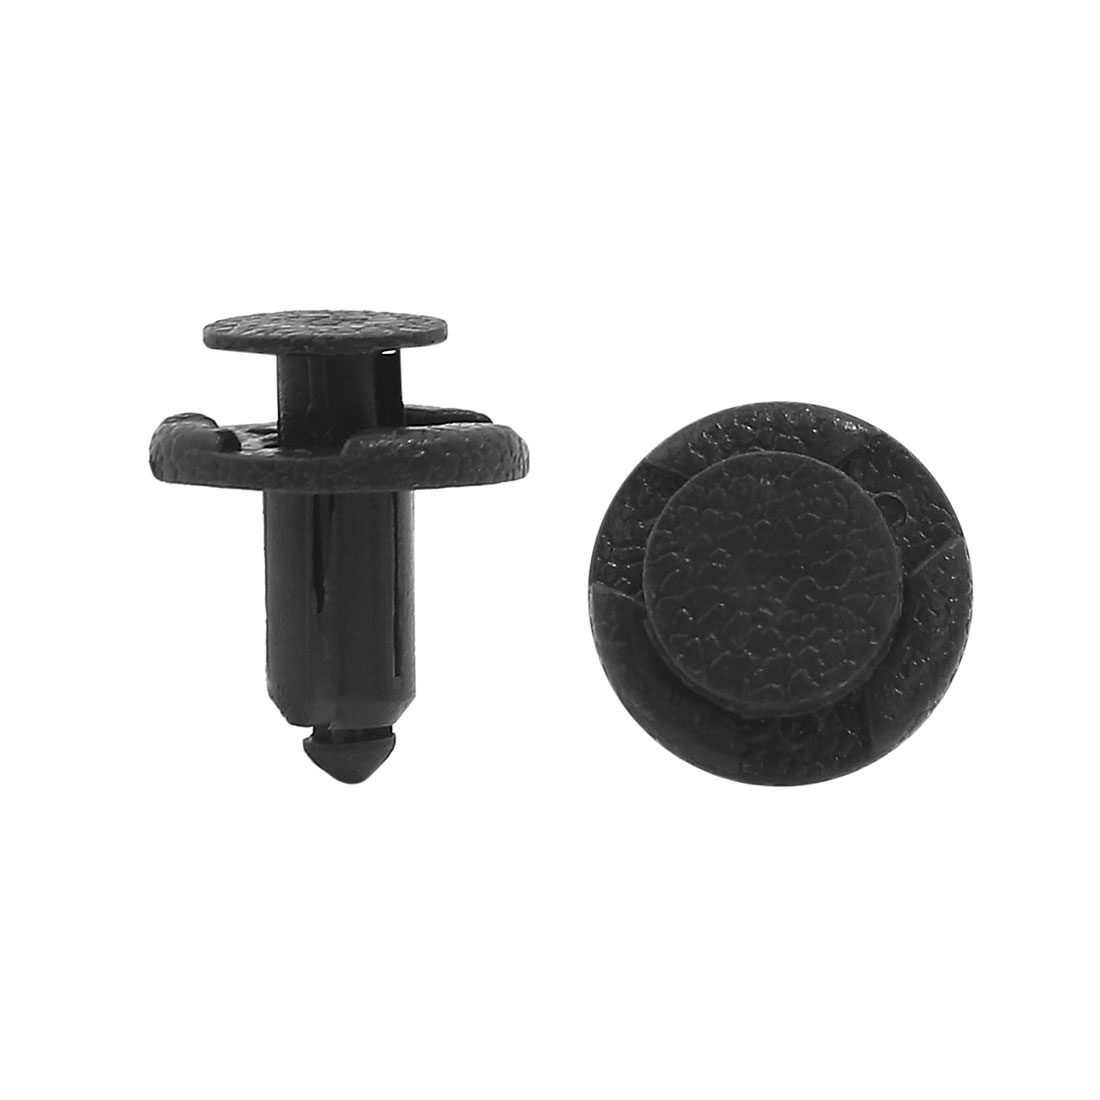 40pcs Black Plastic Rivets Fasteners 8mm Dia Hole for Car Auto Bumper Fender